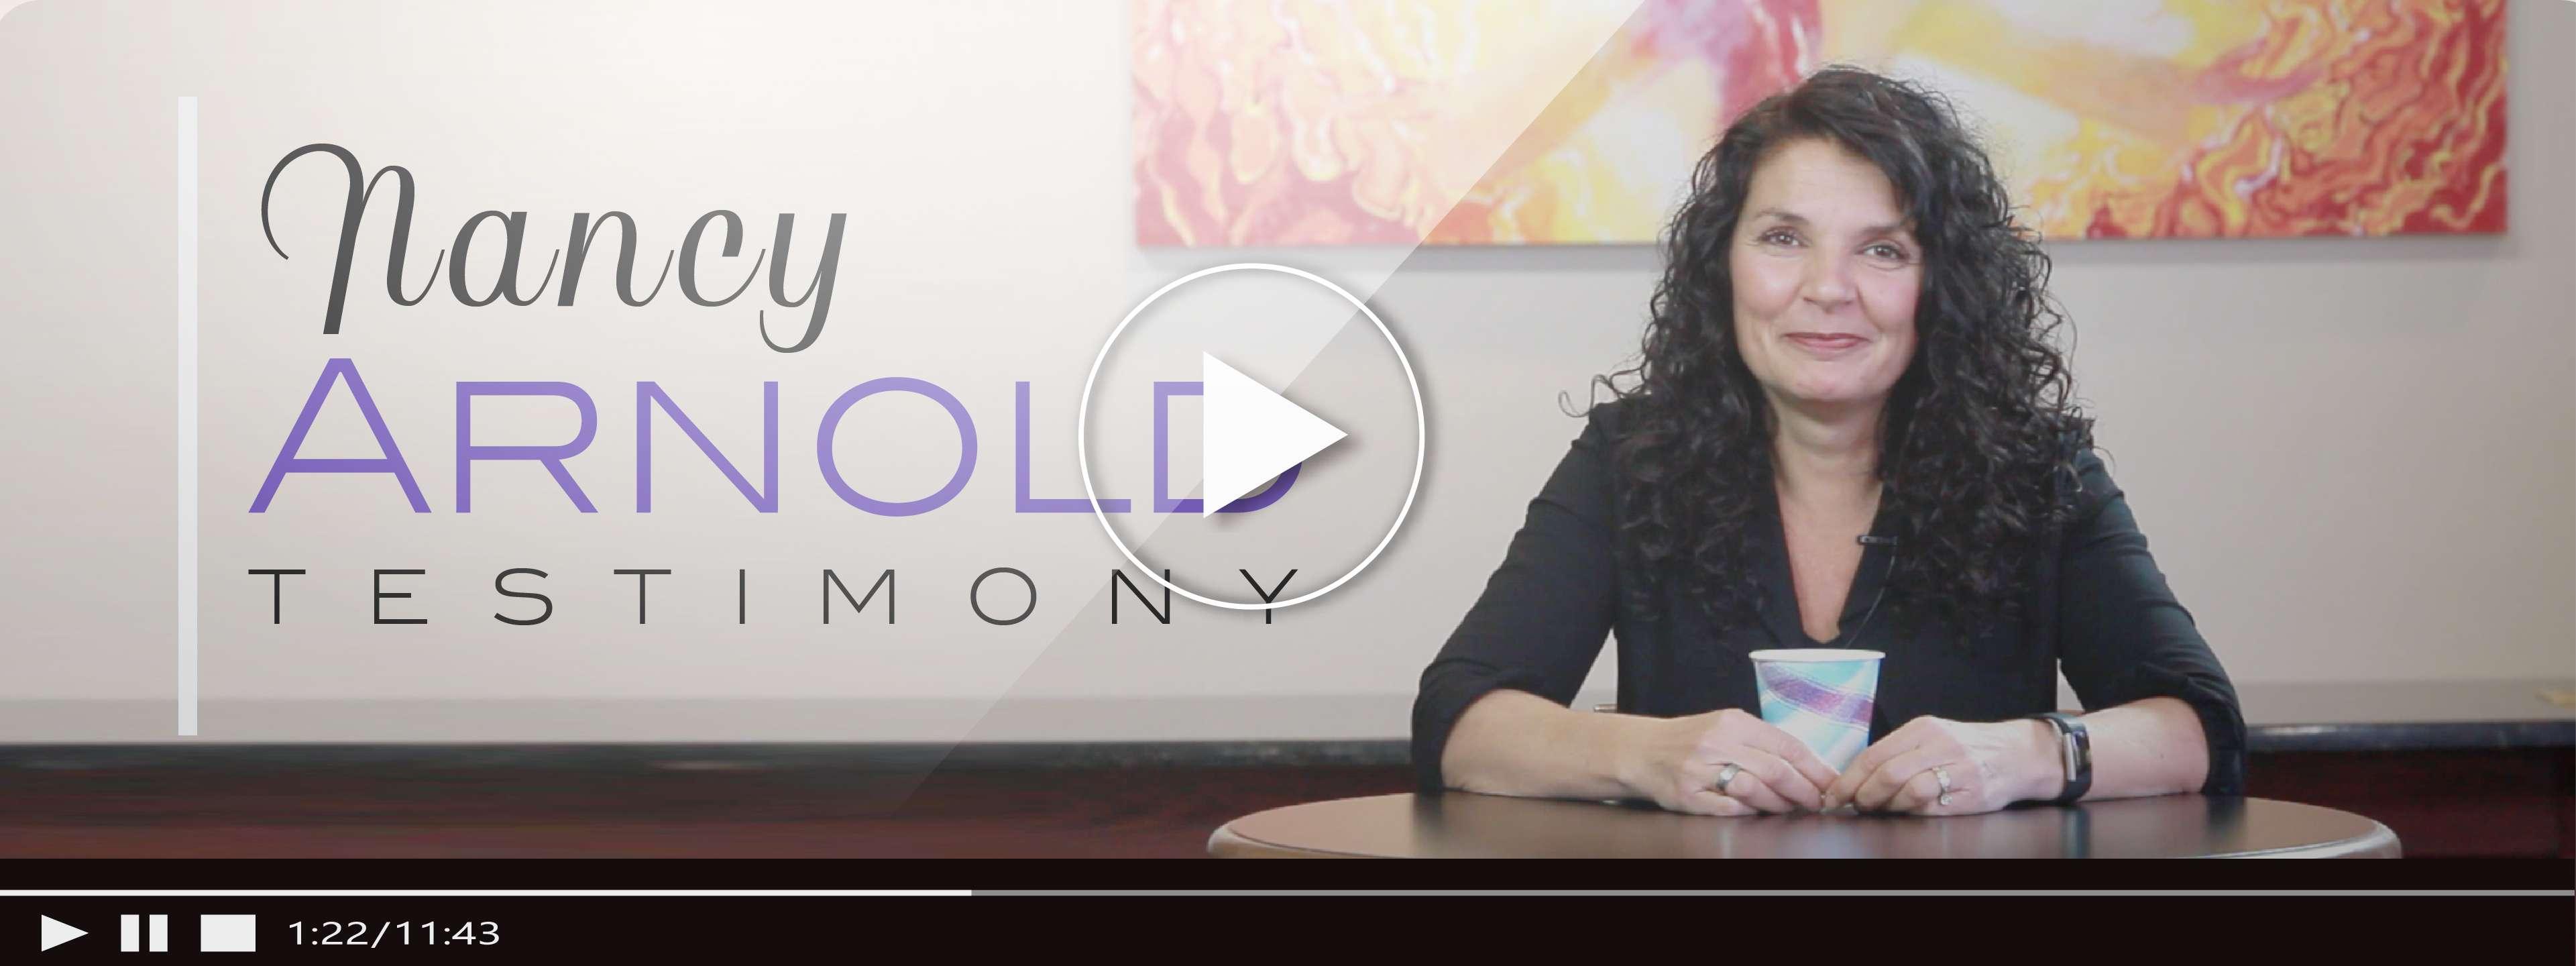 nancy-arnold-7brd-dq2019_testimony-web-banner_video